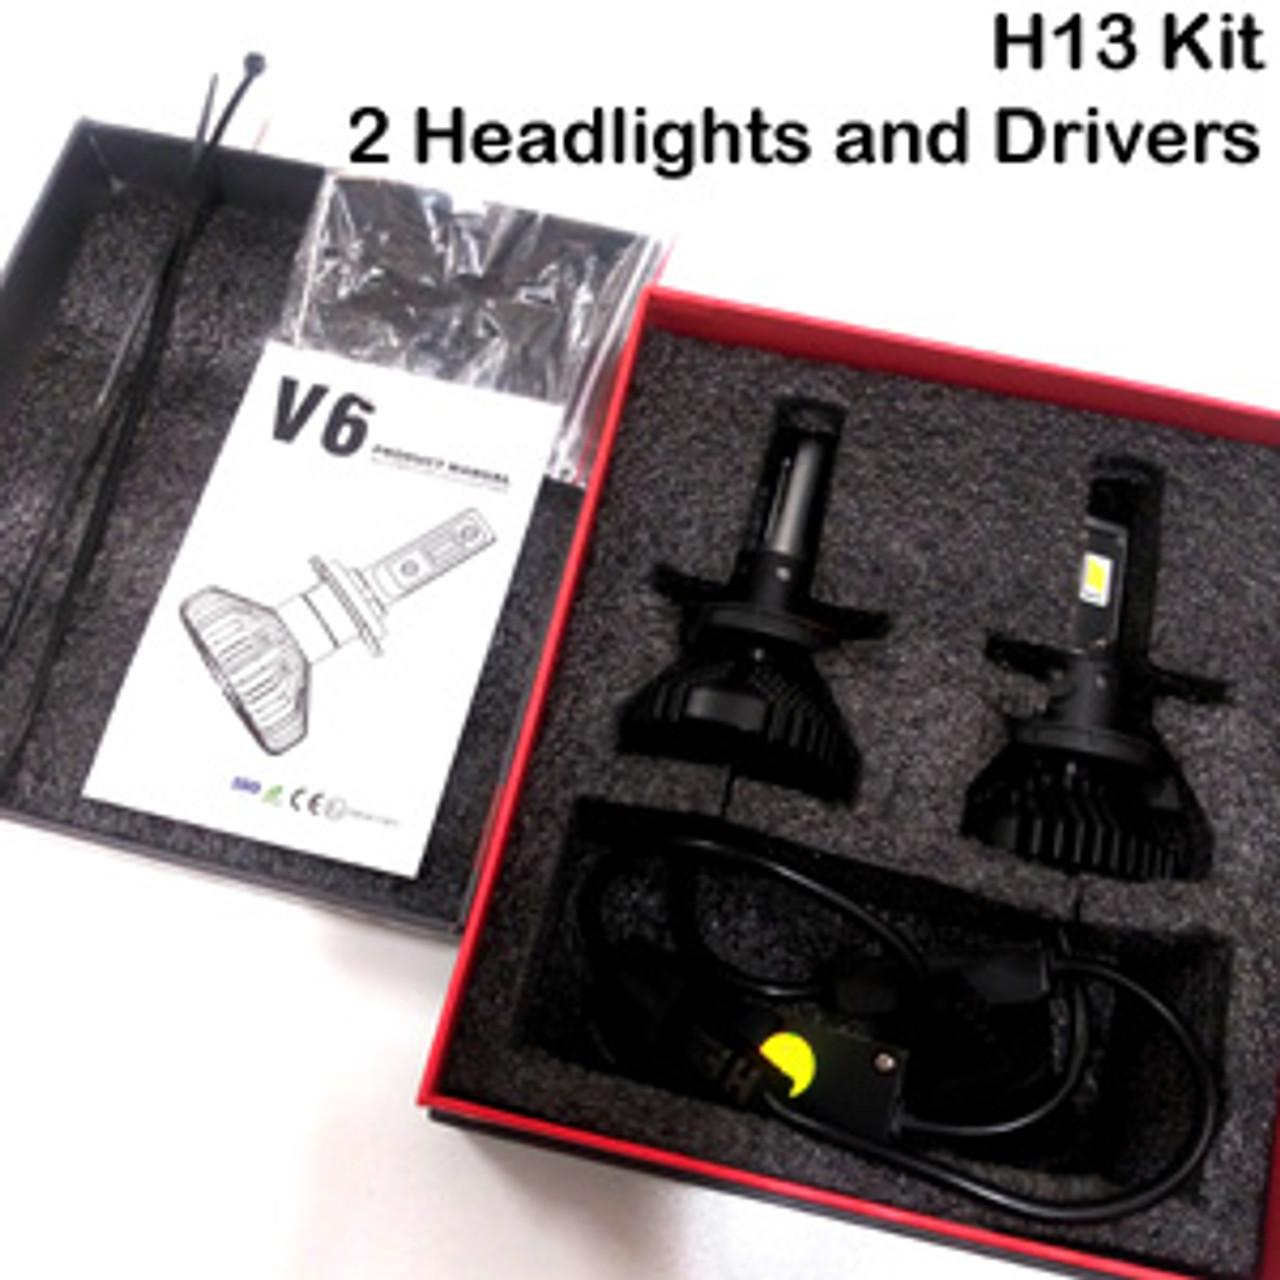 HEADLIGHTS-H13-V6s Headlight Kit with H13 Bases 9008